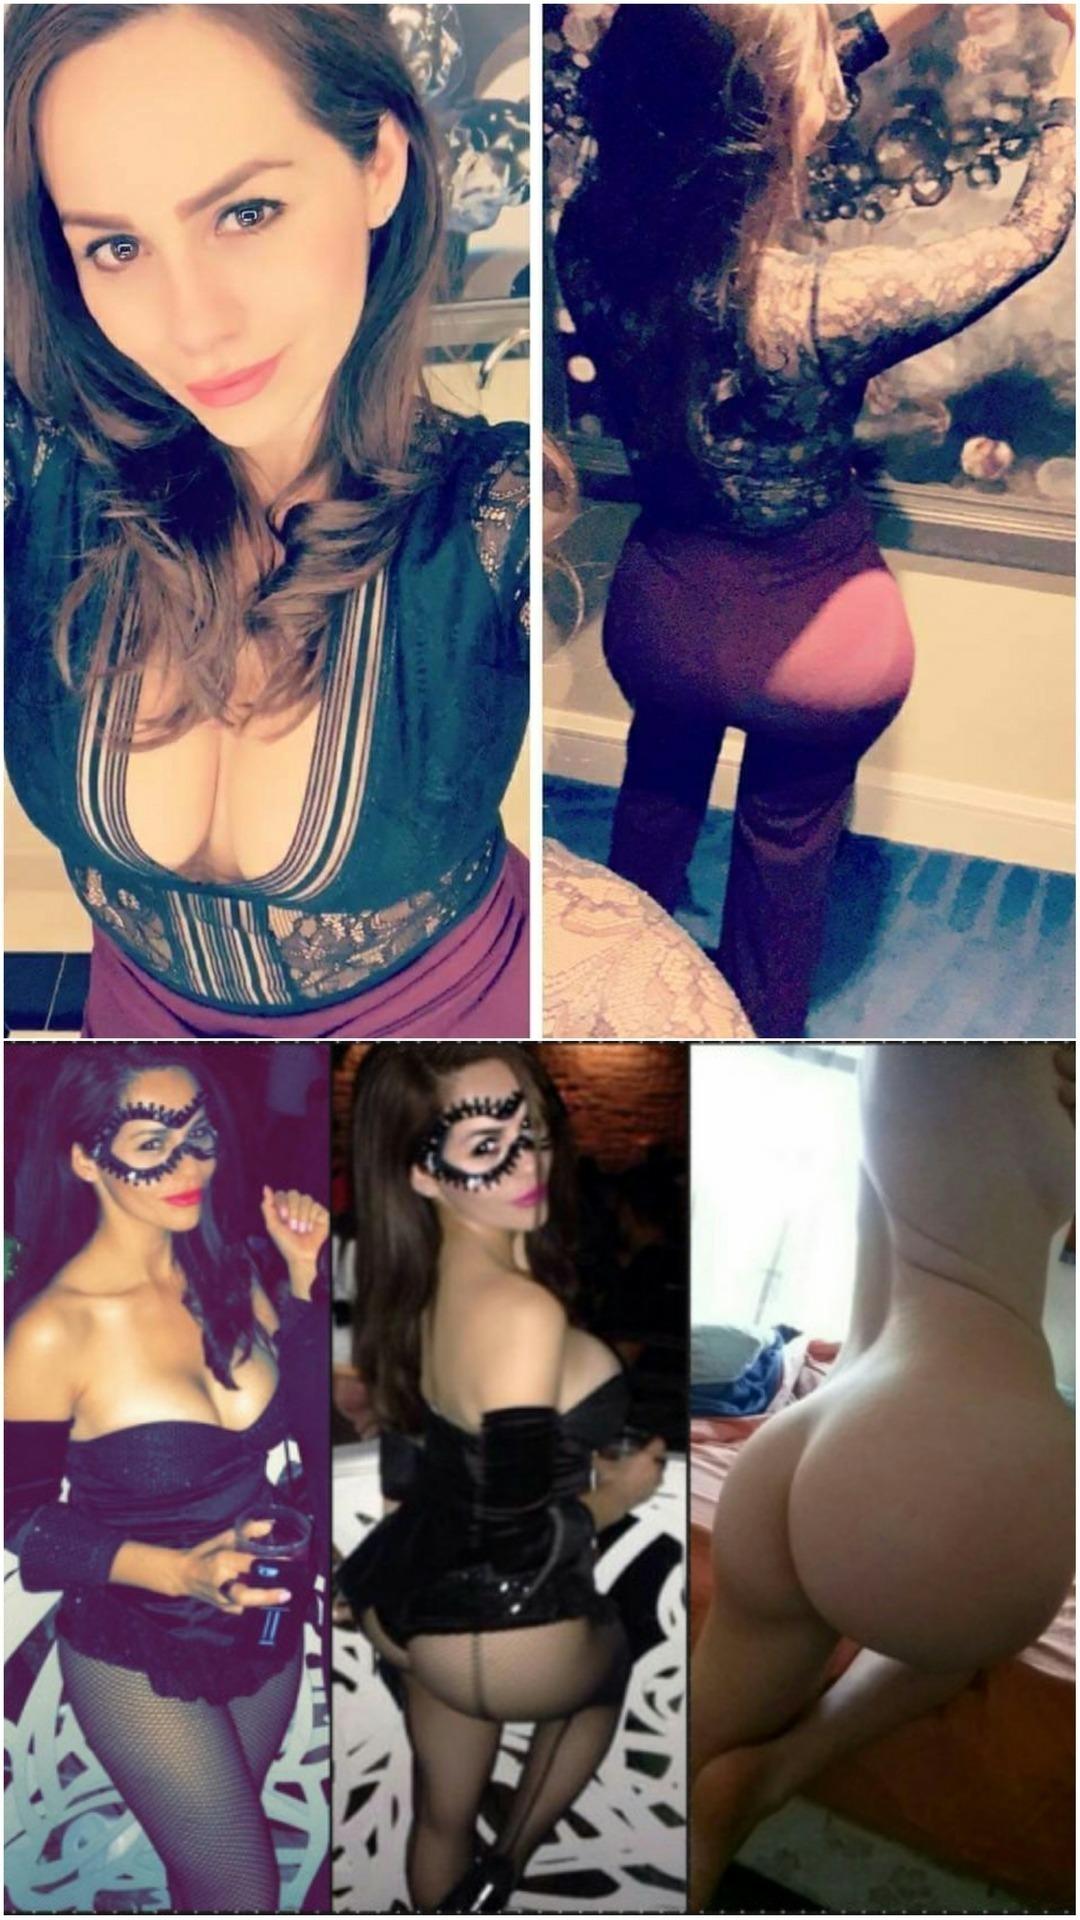 fotos Sobrina puta tetona y culona xxx mujeres hermosas latinas 13